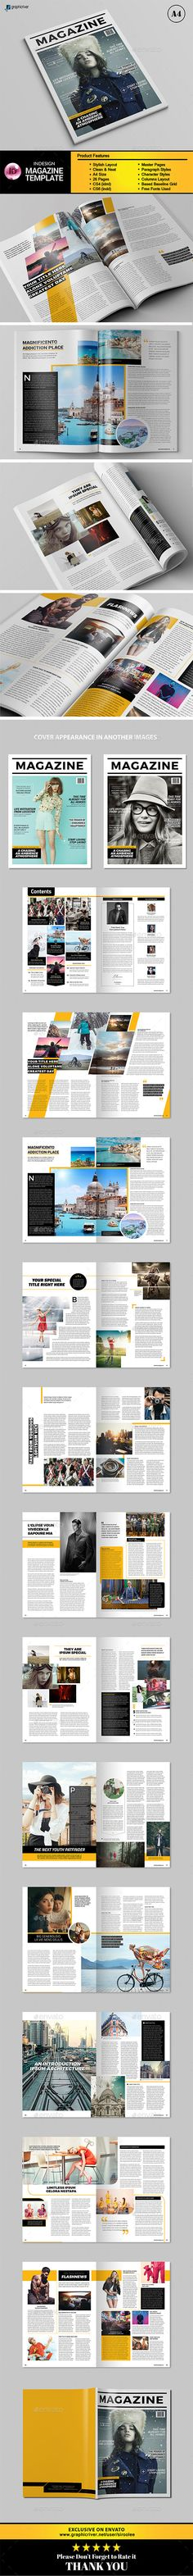 Magazine Template InDesign INDD. Download here: http://graphicriver.net/item/indesign-magazine-vol3/16198409?ref=ksioks